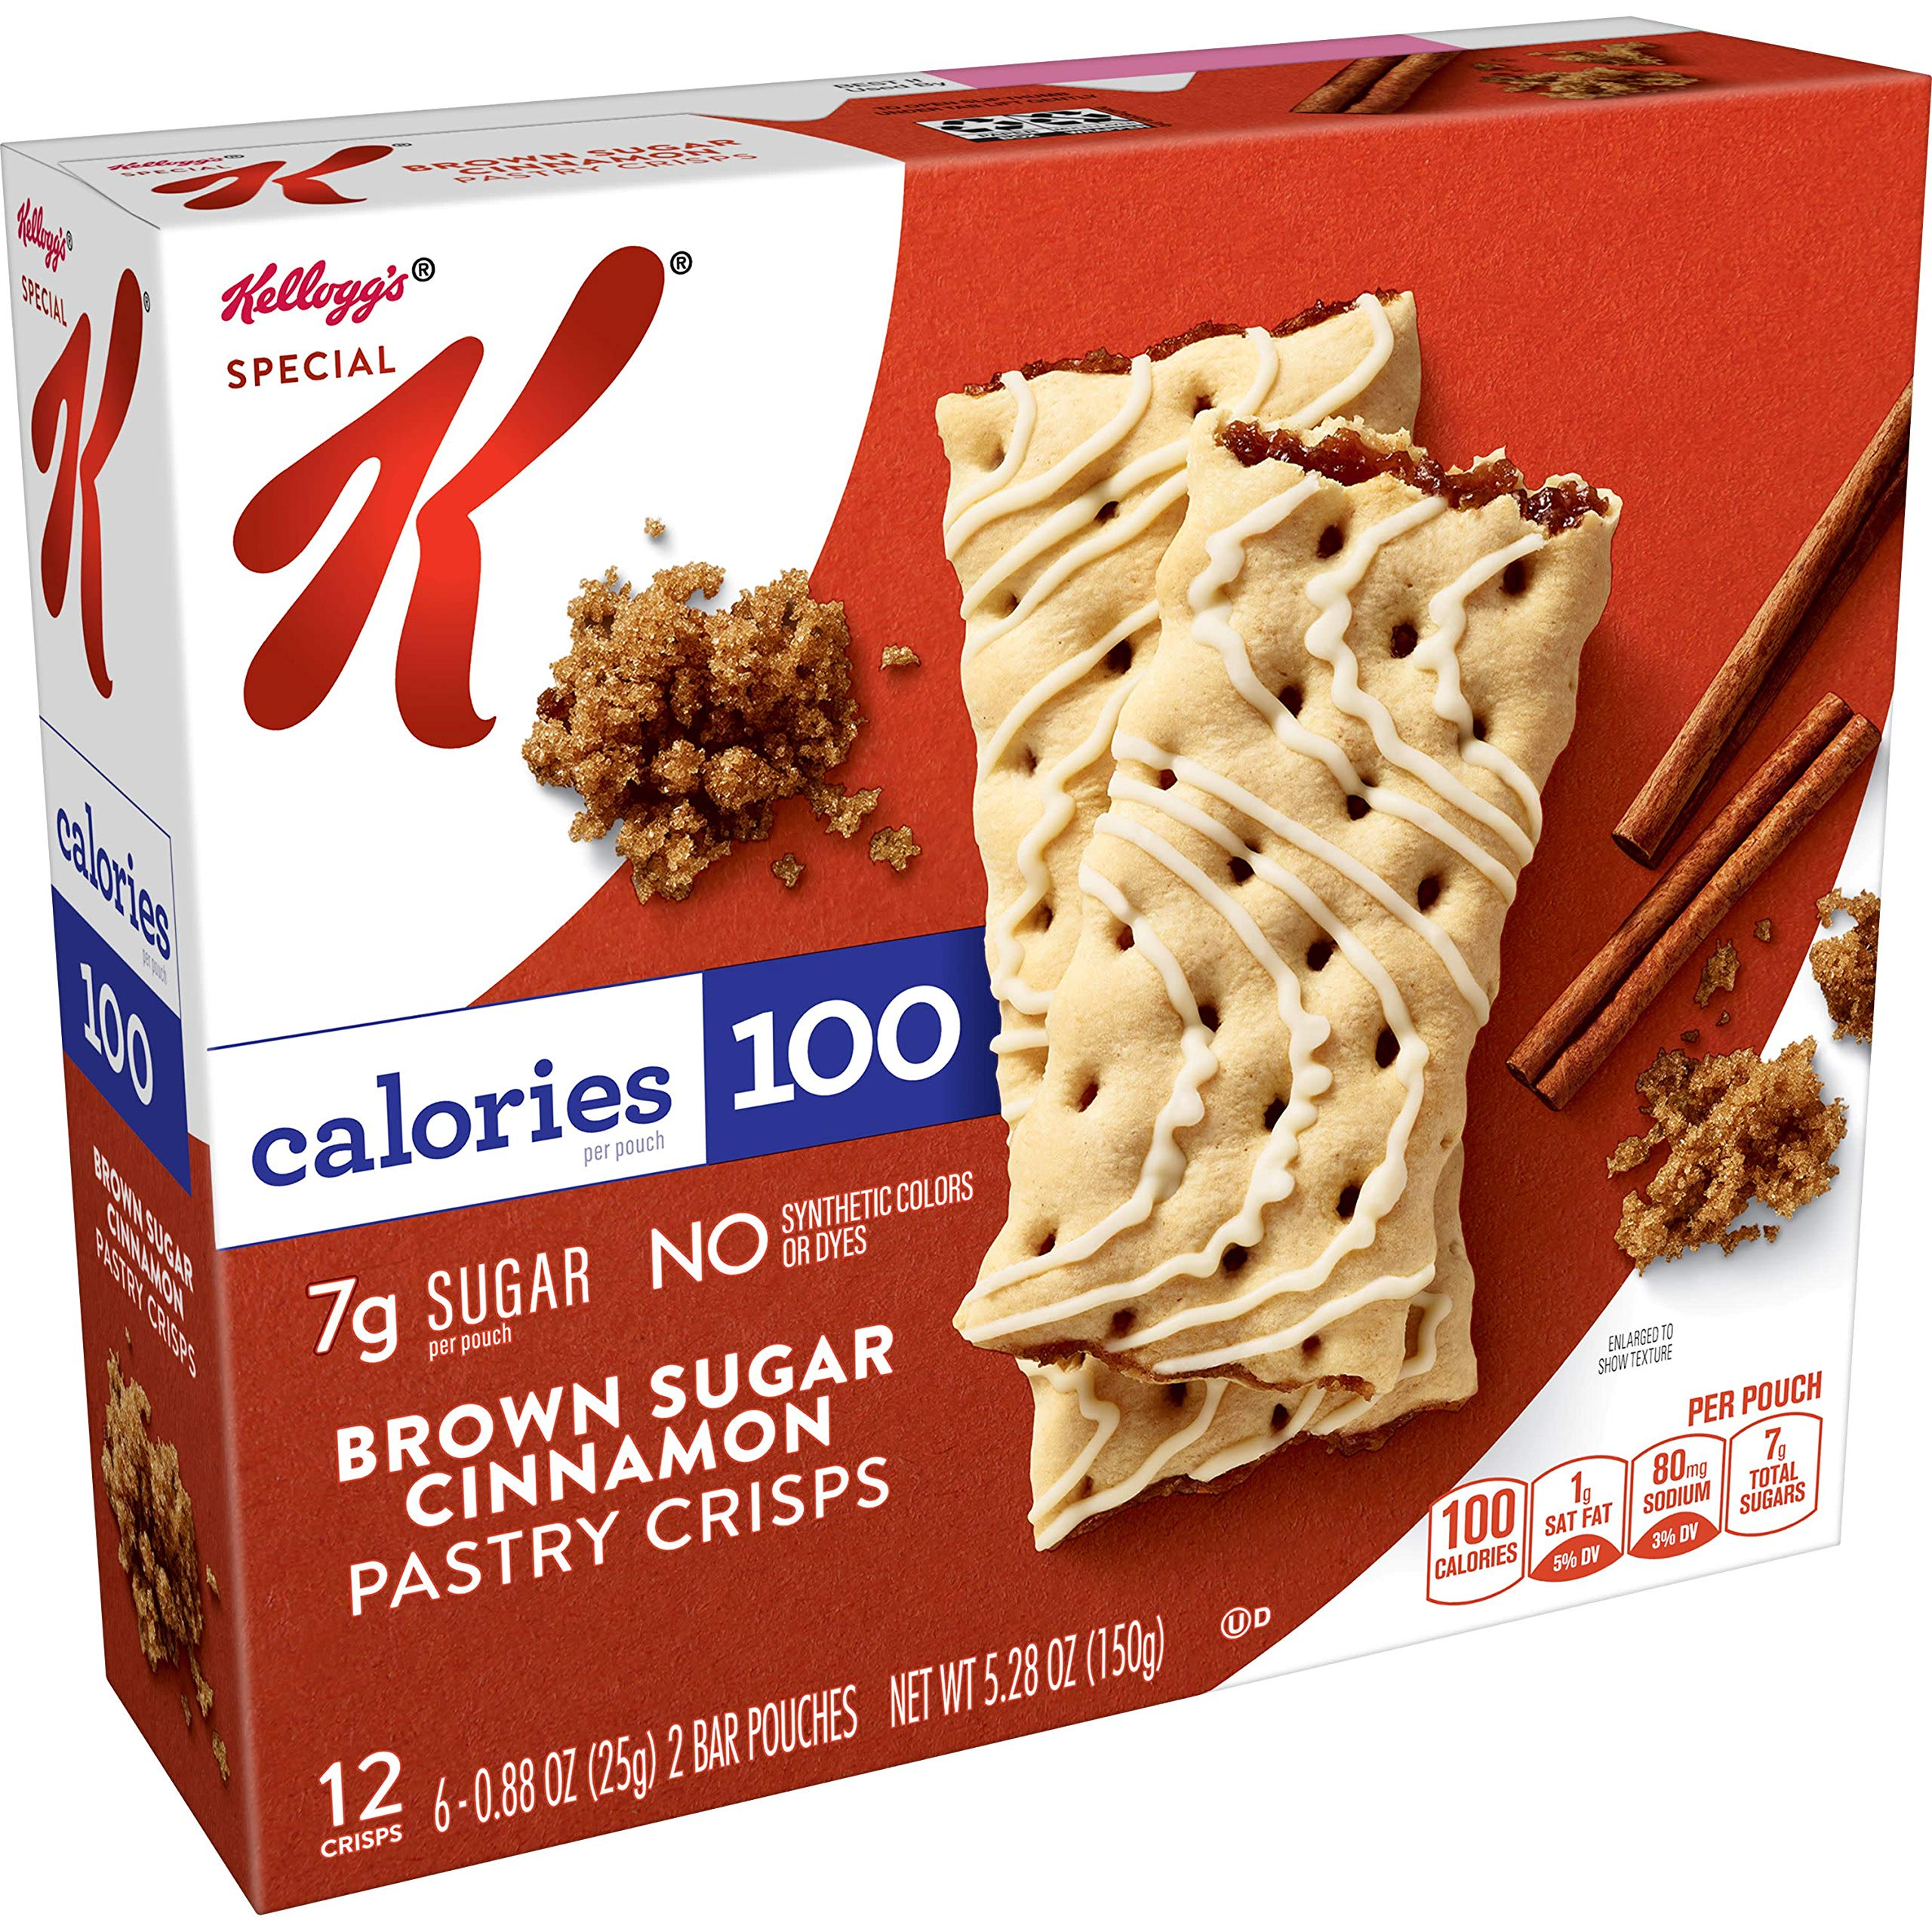 Special K Pastry Crisps, Brown Sugar Cinnamon, 5.28 oz, 12 Crisps, 2 per Pouch (6 Pouches)